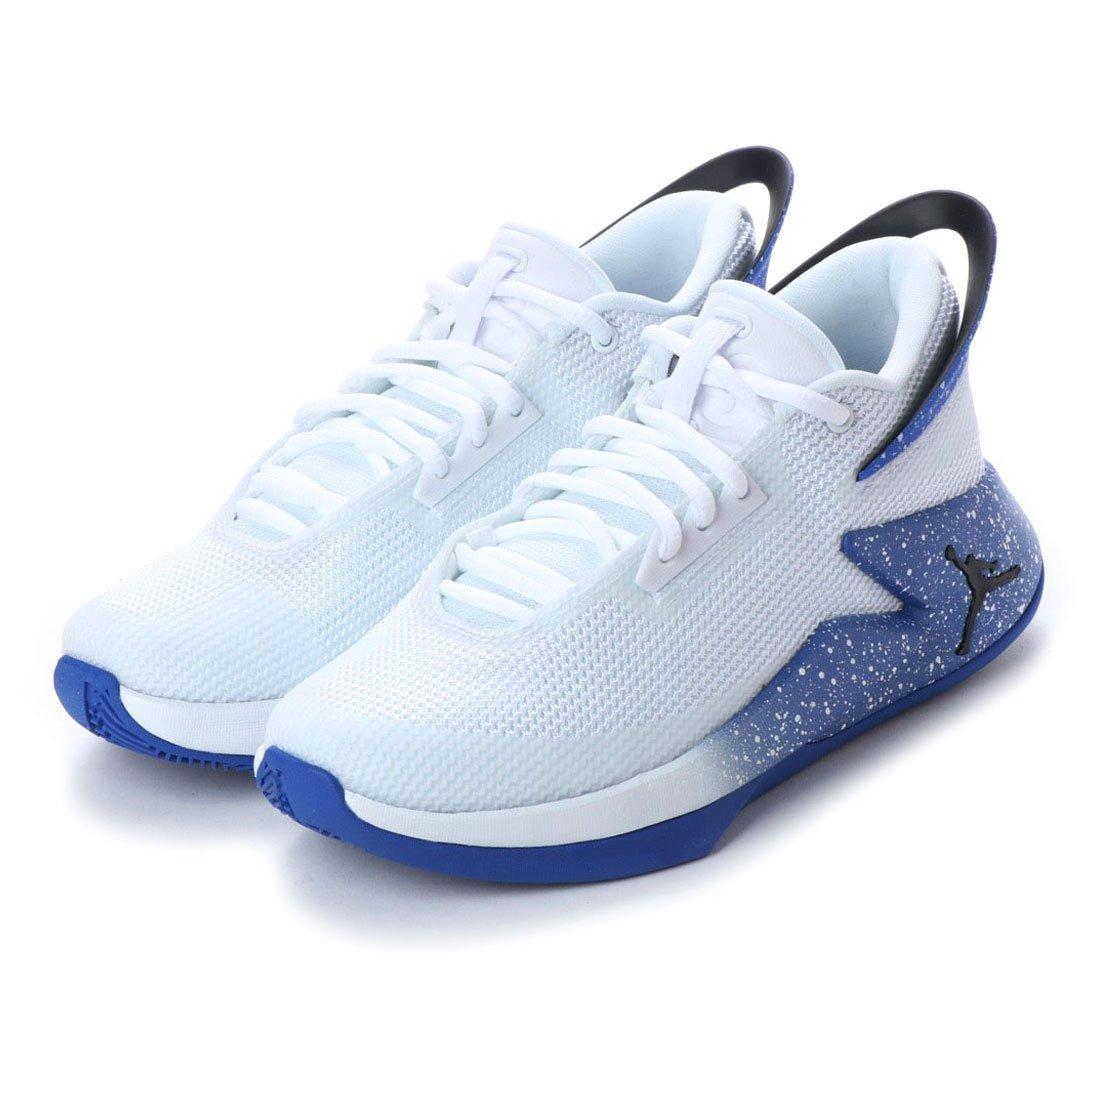 official photos 5eaa2 6c5d3 Tenis Nike Jordan Fly Lockdown Nba Talla  23mx Original -   1,549.00 ...